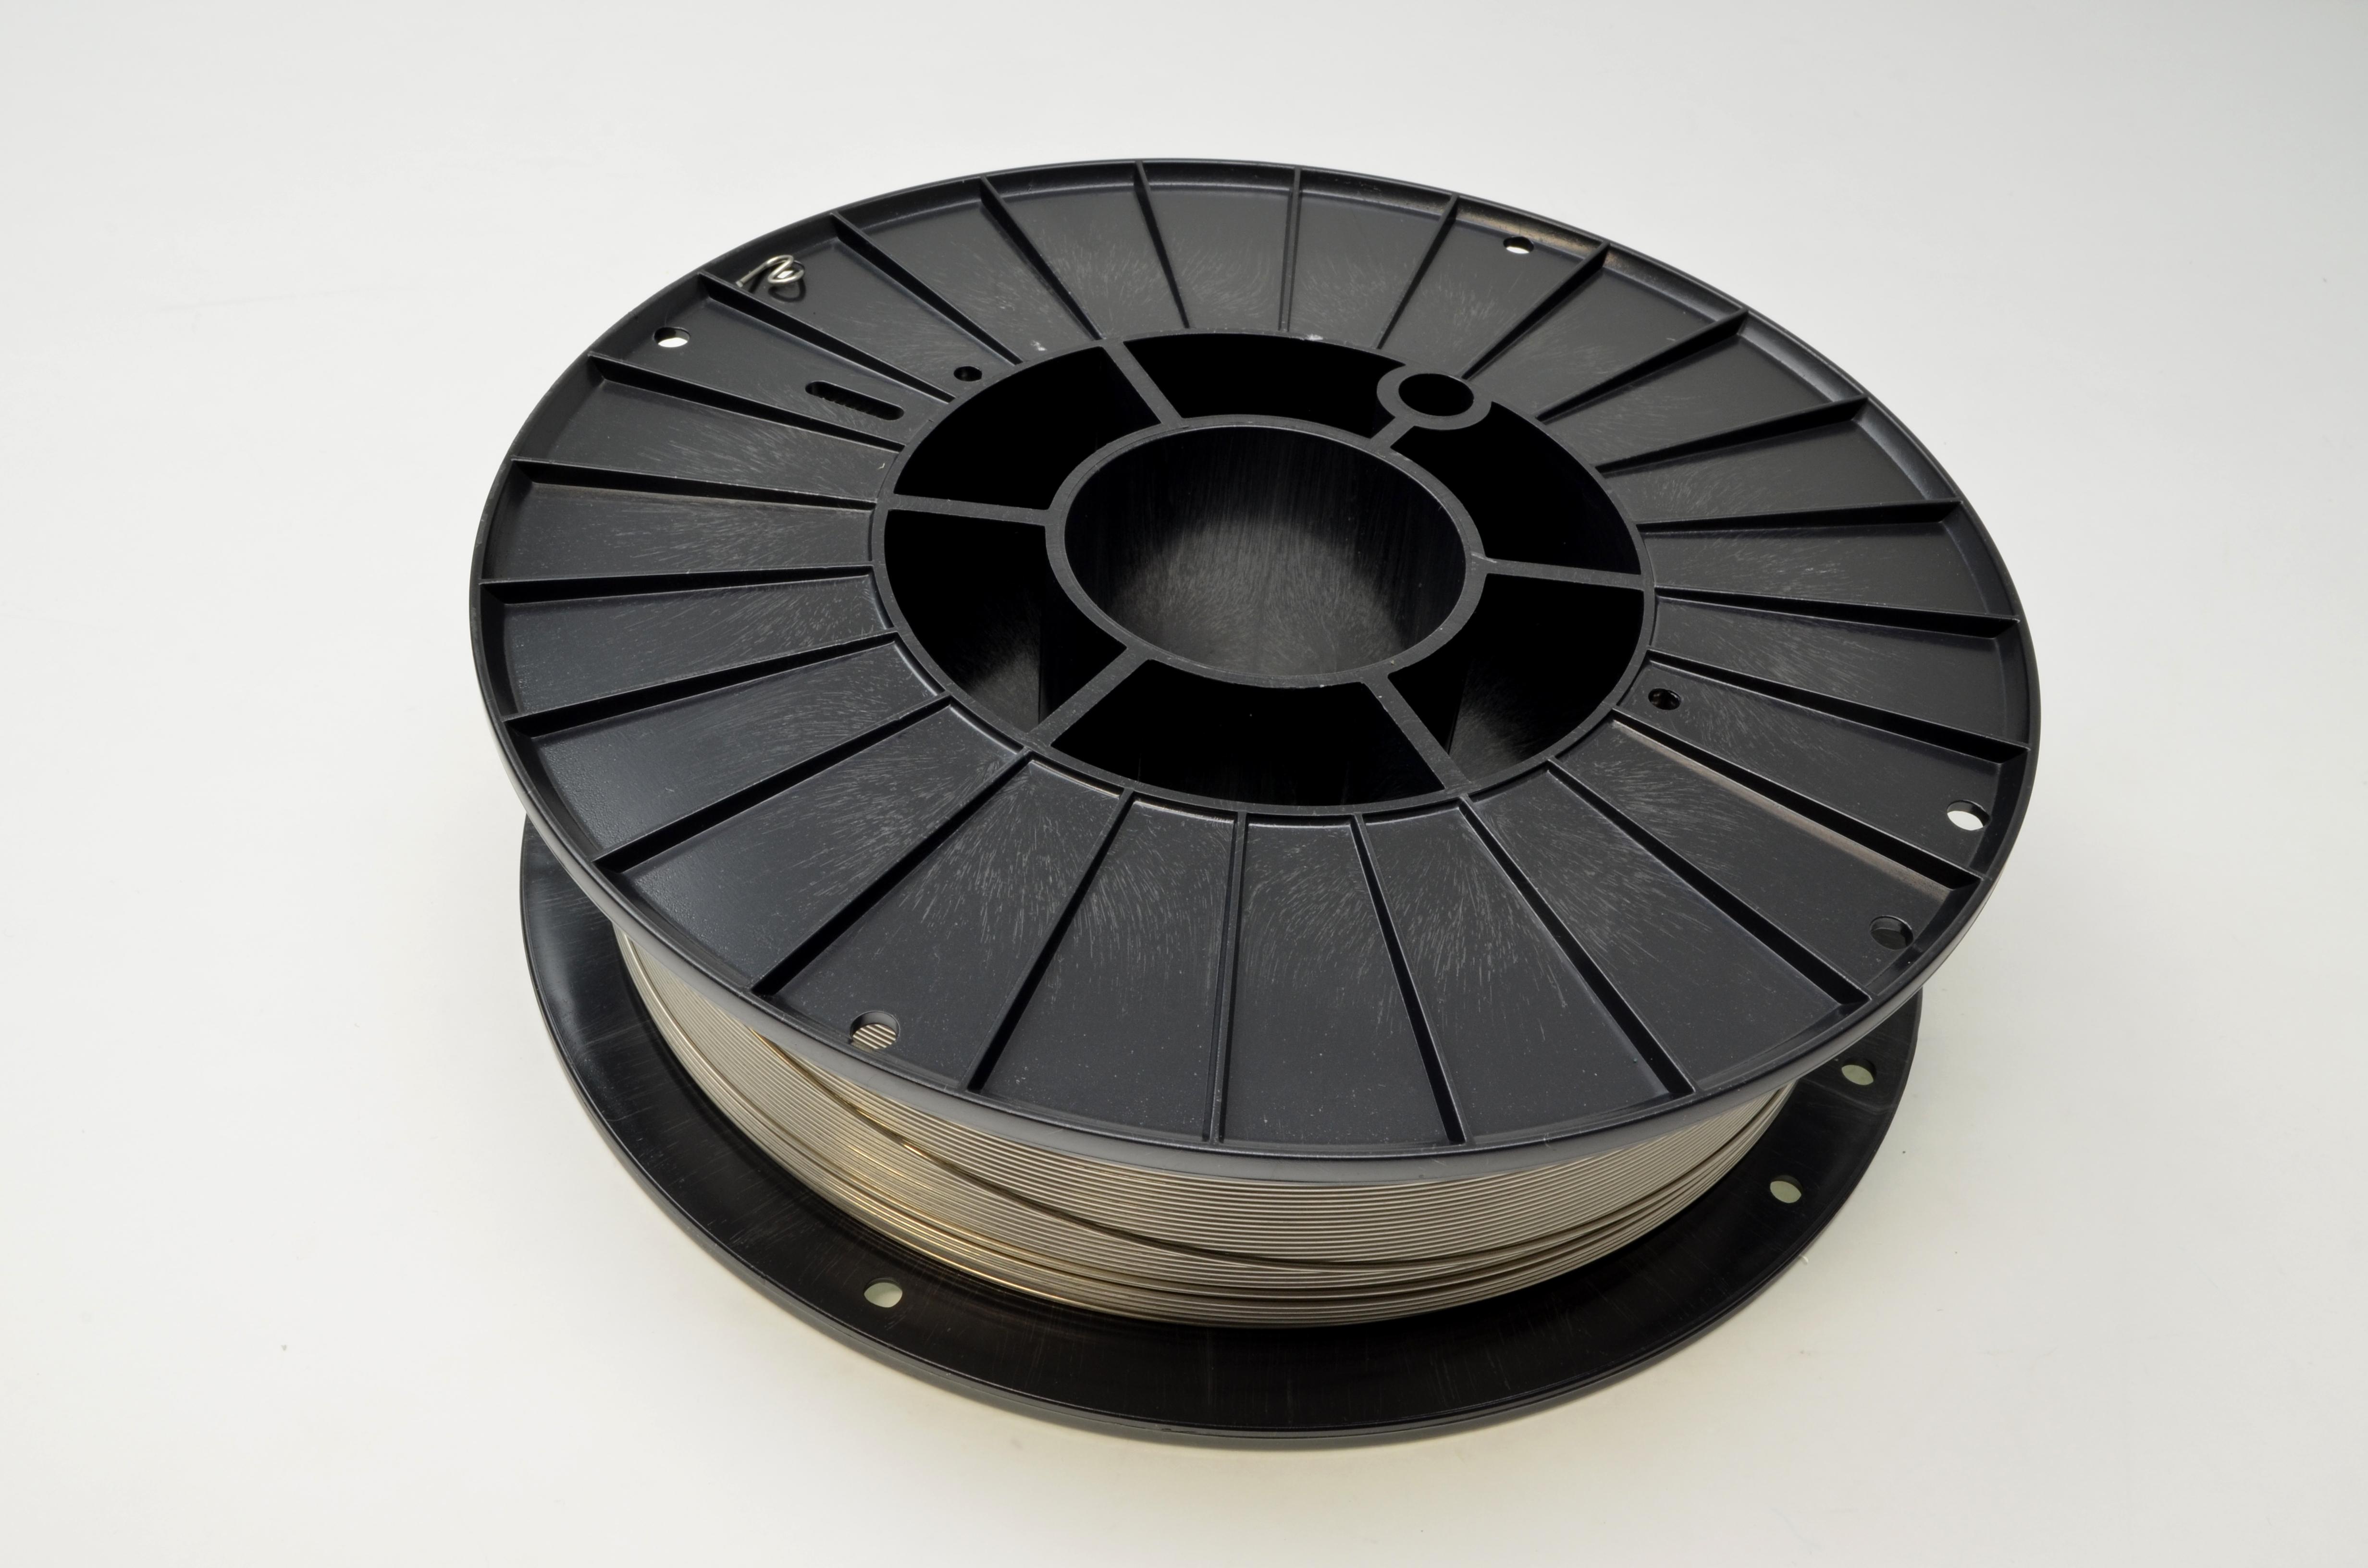 schutzgas schwei draht edelstahl v4a werkstoff 5. Black Bedroom Furniture Sets. Home Design Ideas